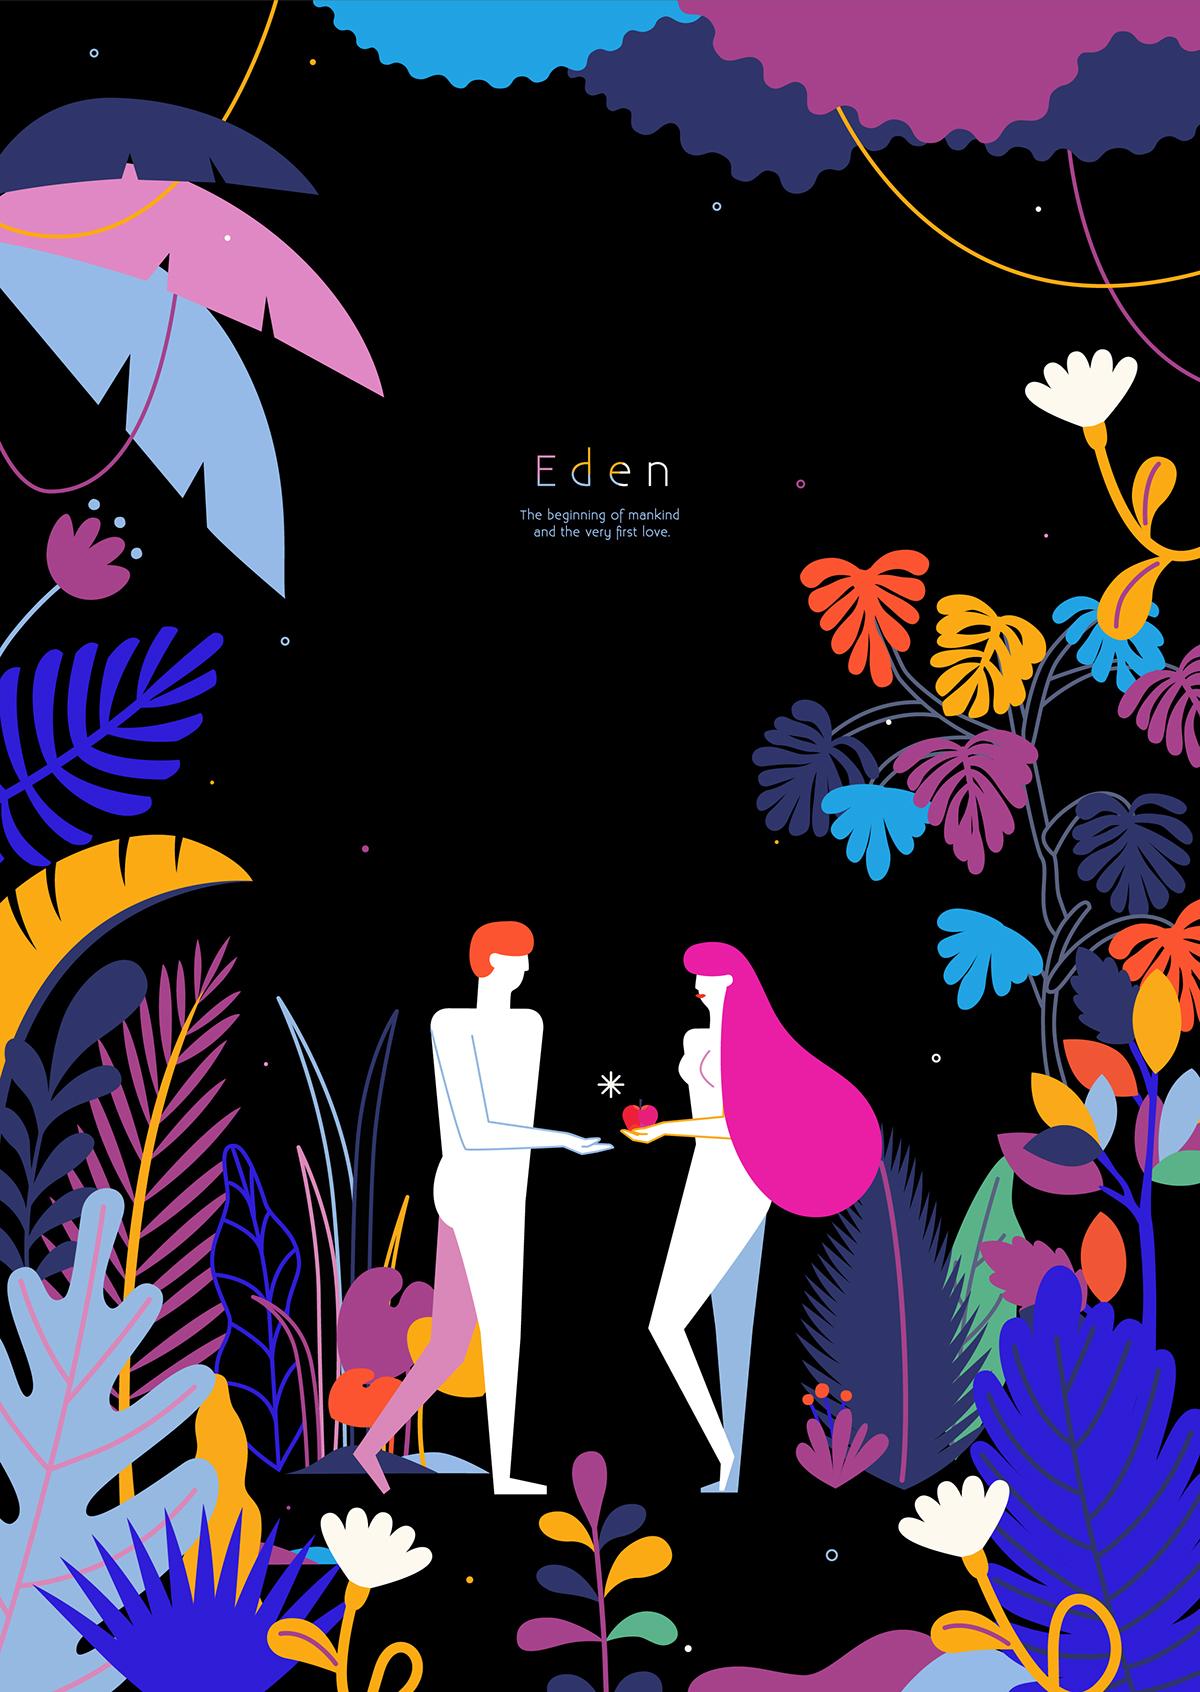 Eden 插画/动漫欣赏 – 欧美插画作品精选